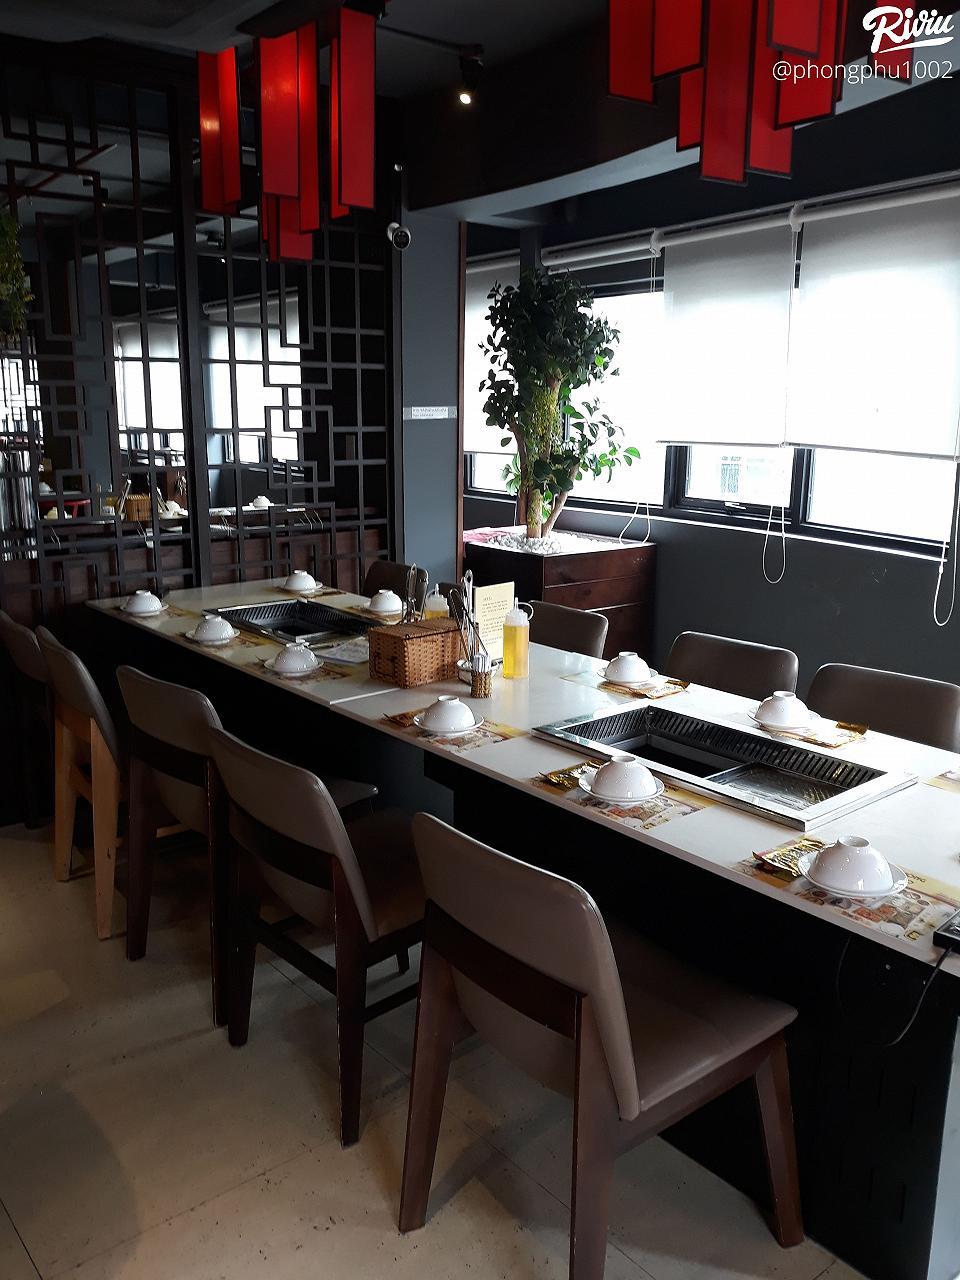 10* cho buffet lau nuong 180k sik dak food - anh 14